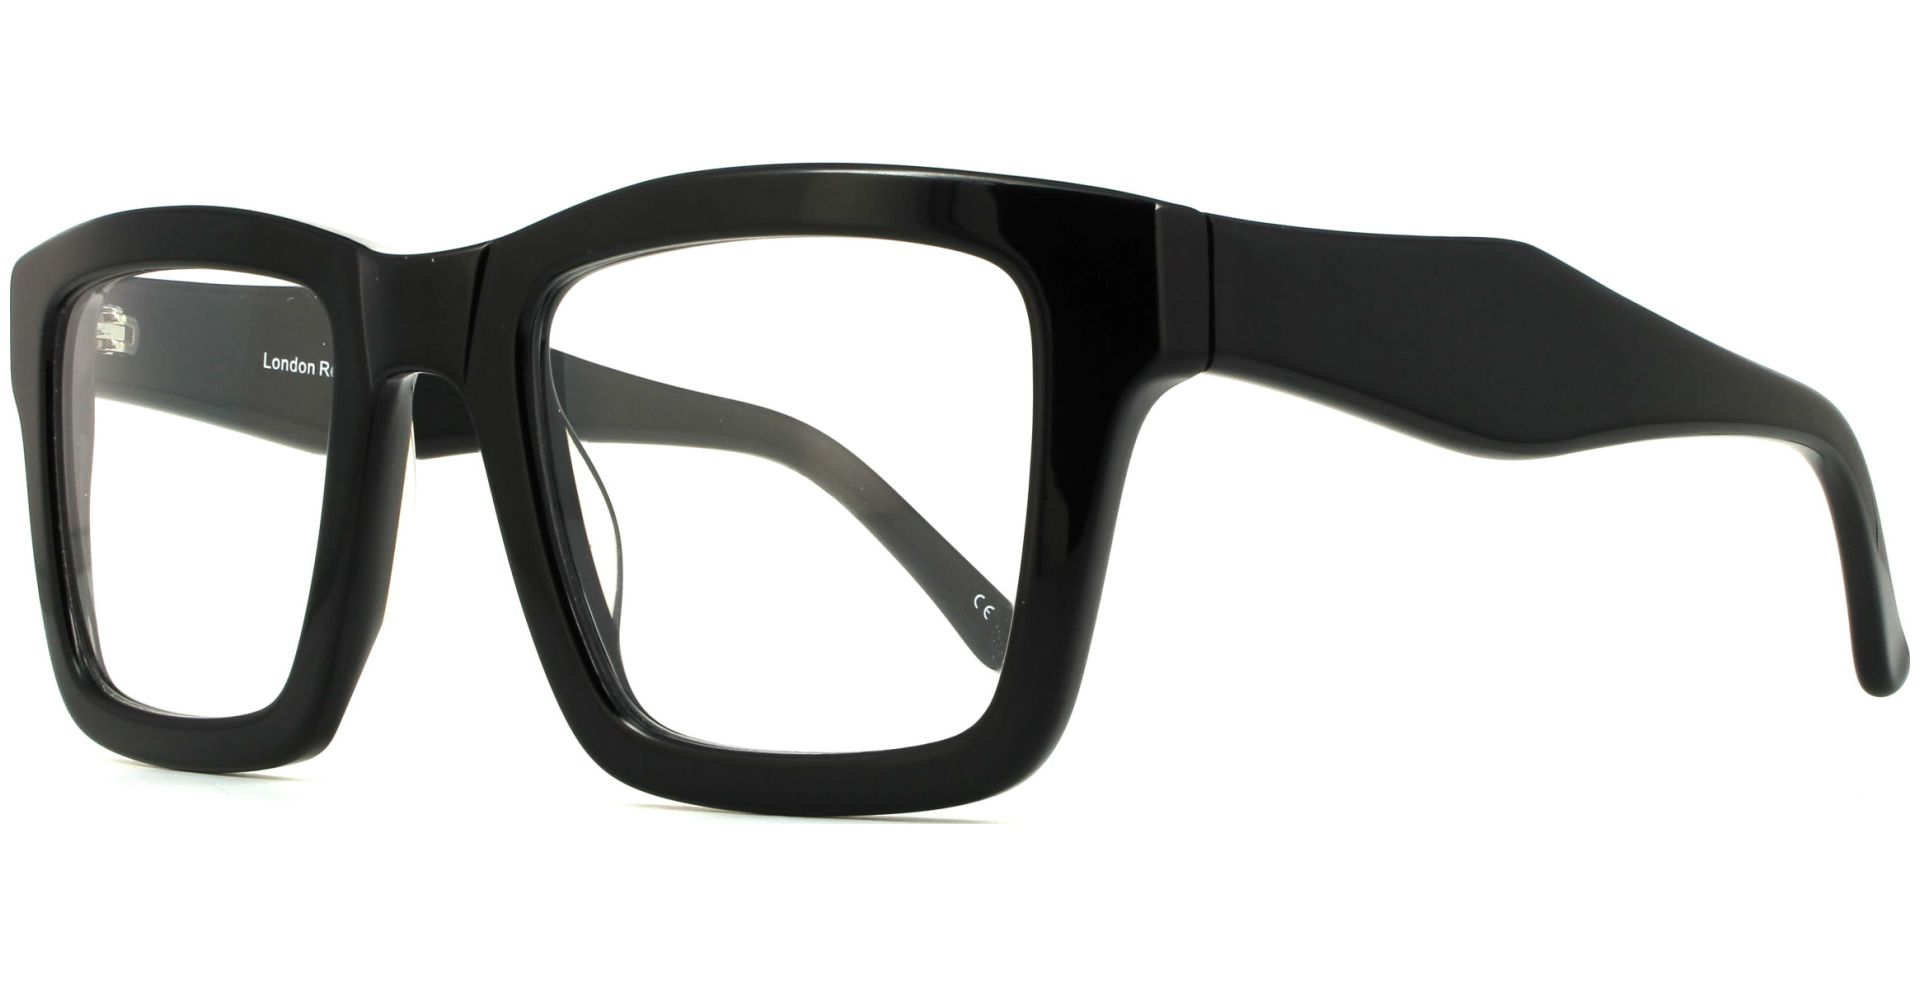 Nerd Brillen - Trends & Styles Brillen